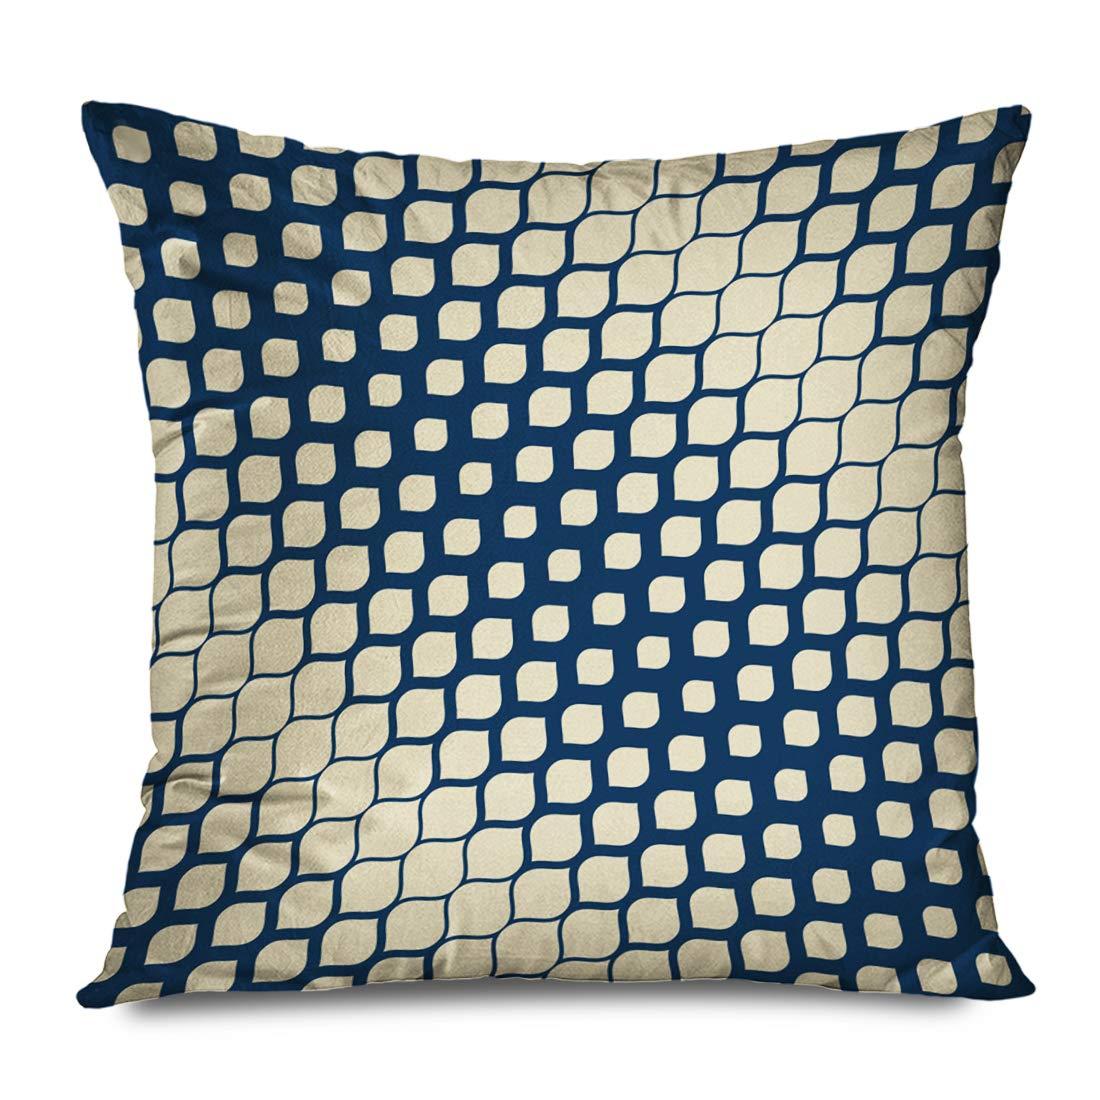 Ahawoso Throw Pillow Cover Square 18x18 Blue Animal Halftone Geometric Elegant Skin Abstract Carpet Cool Diagonal Moire Diamond Petal Fade Decorative Zippered Cushion Case Home Decor Pillowcase